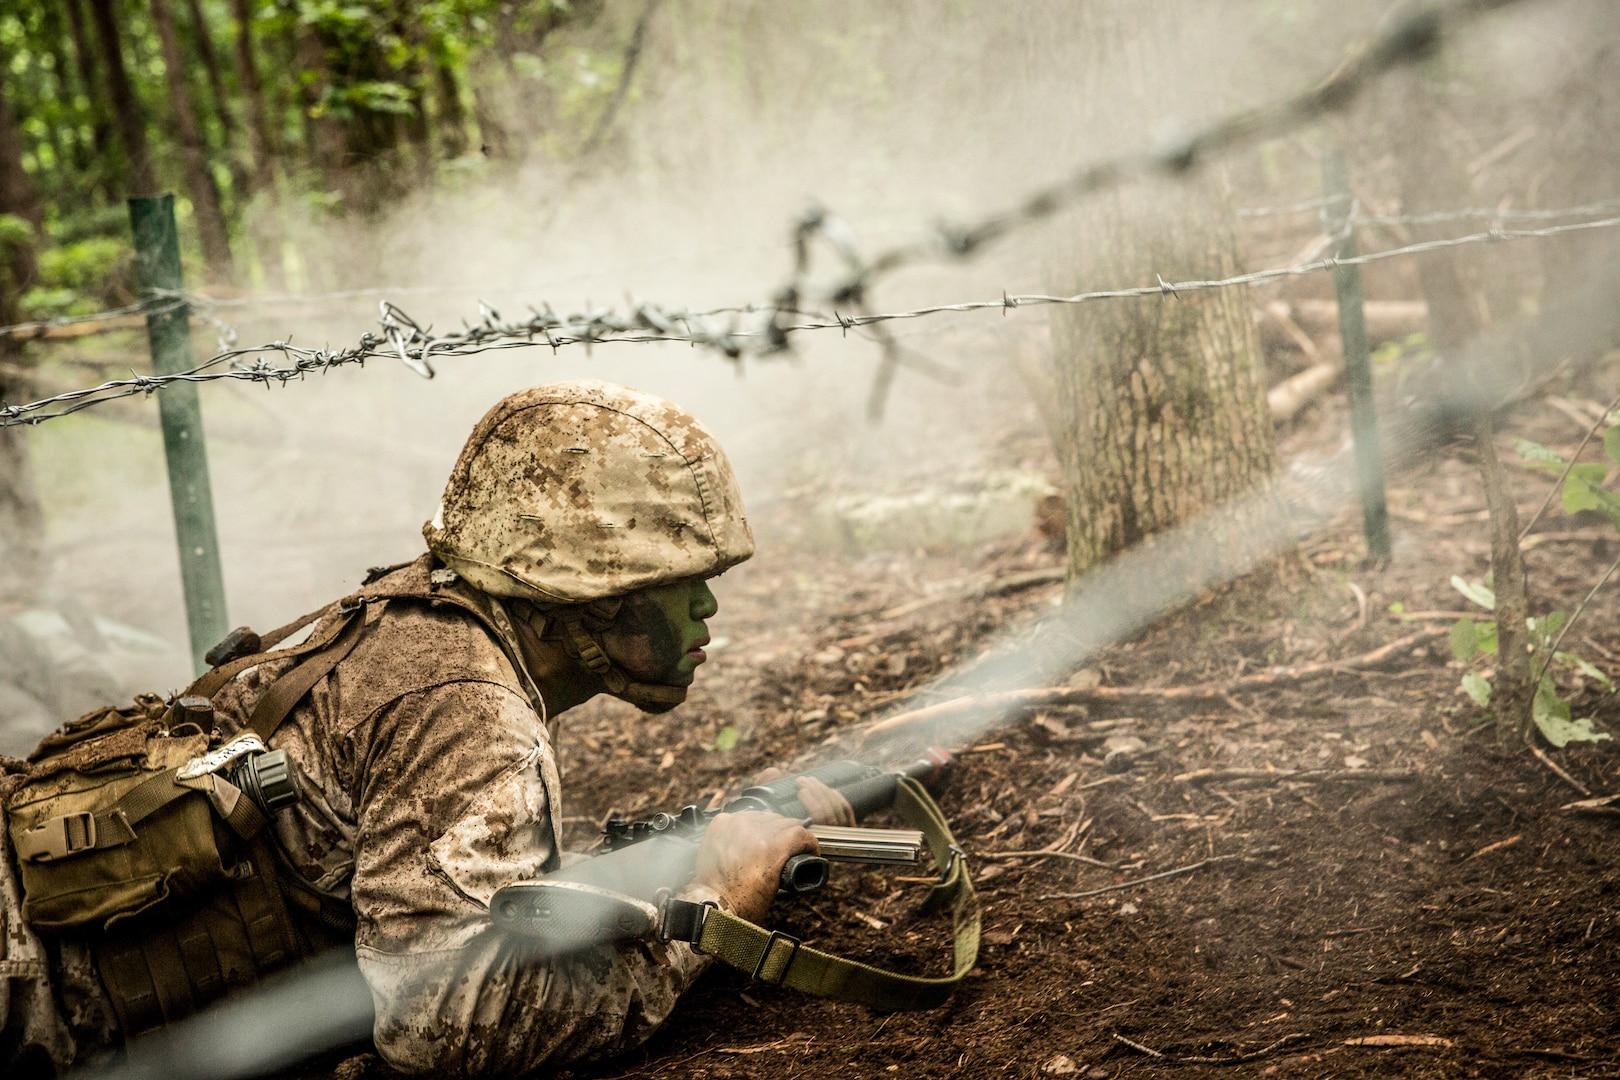 Marine Candidate participates in fire team assault course at Officer Candidates School, Marine Corps Base Quantico, Virginia, June 17, 2017 (U.S. Marine Corps/Cristian L. Ricardo)